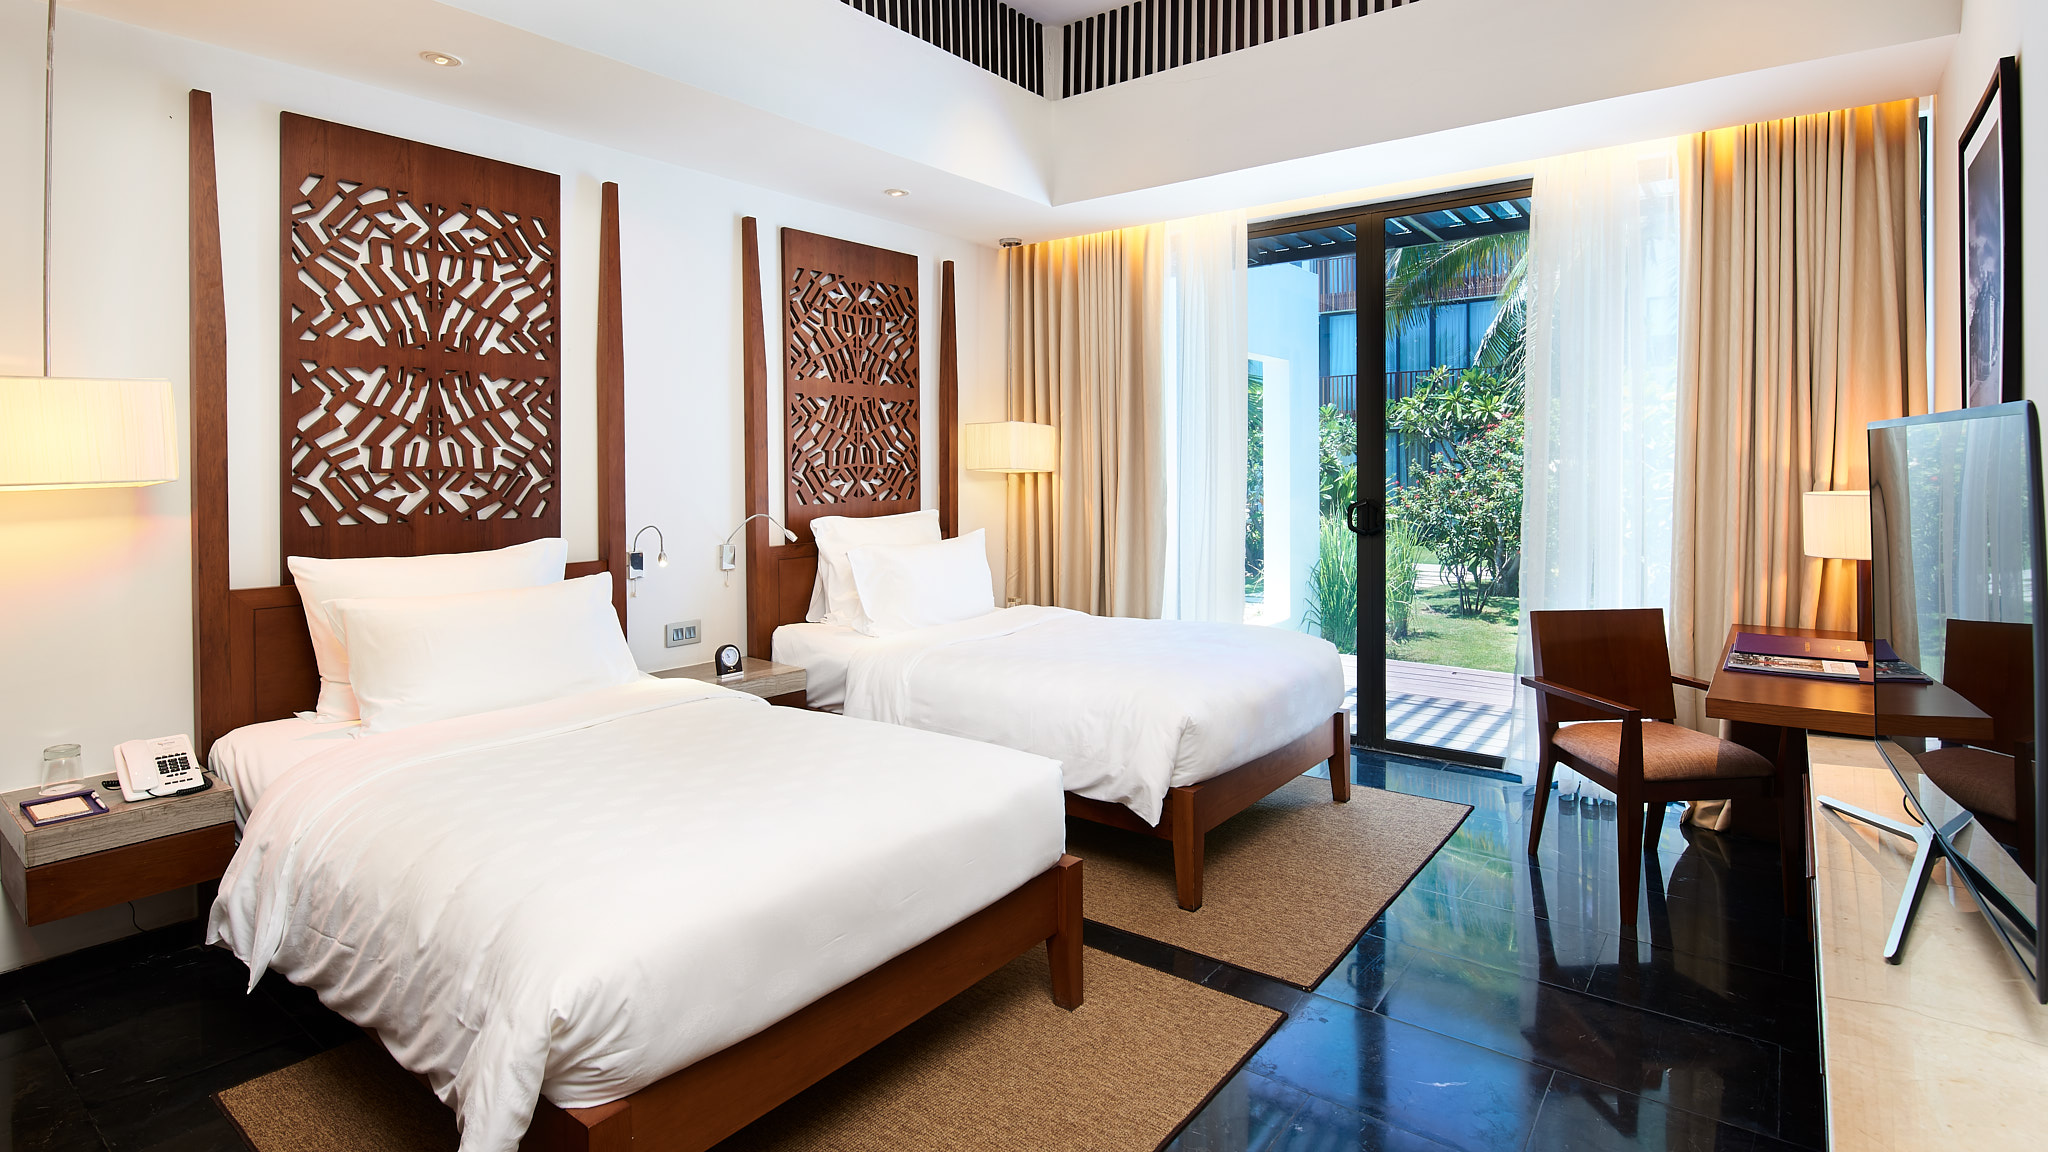 0134_Sunrise Hoi An_Villa 2 Bedroom 2 beds .jpg